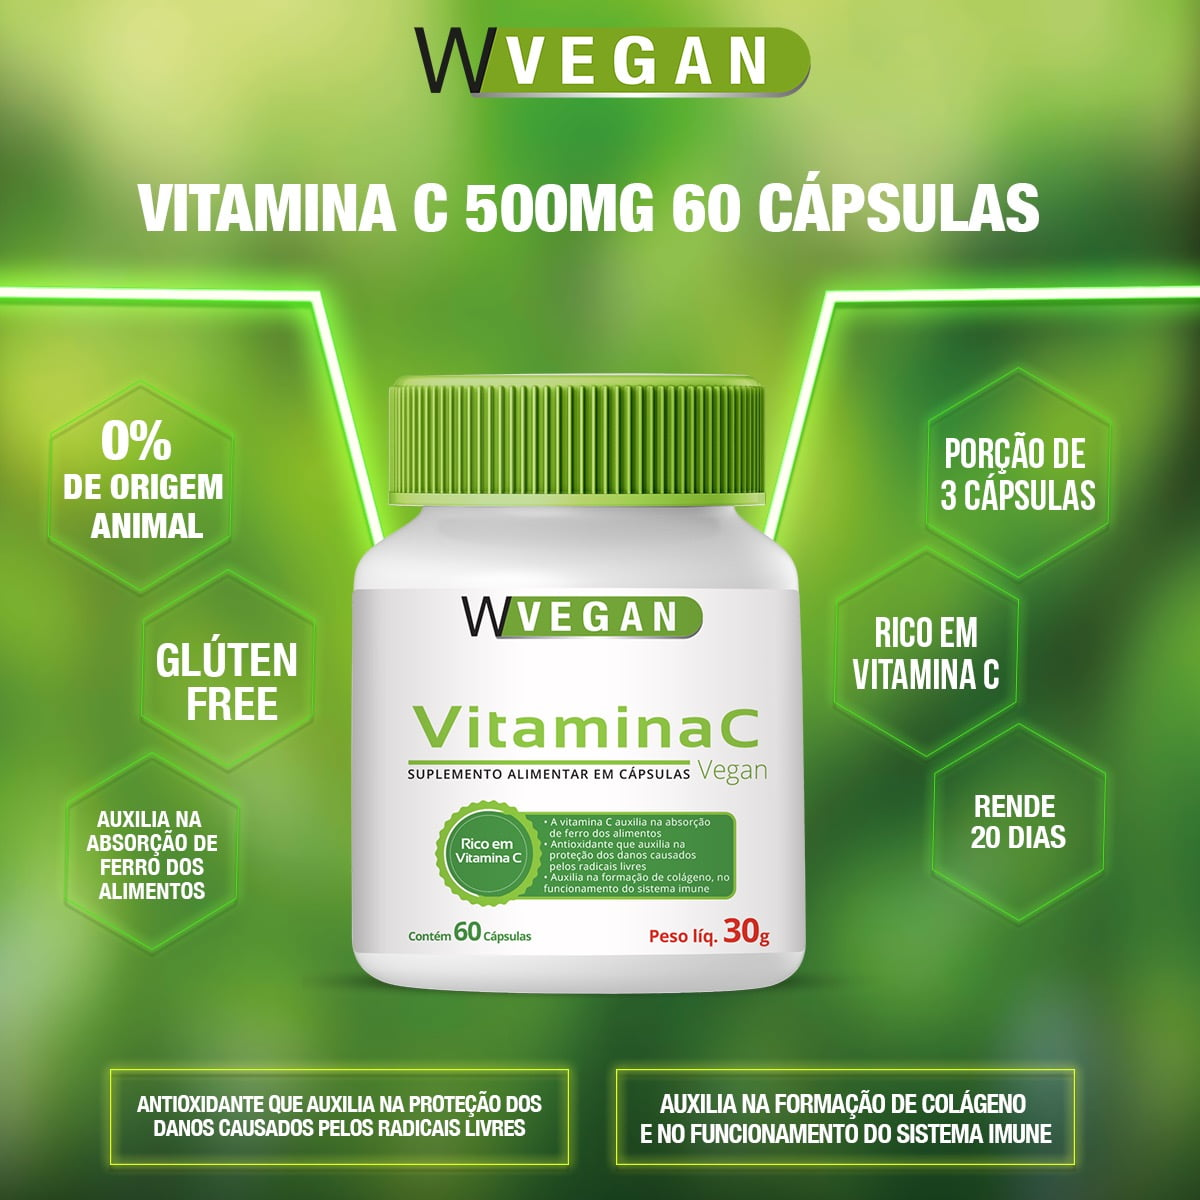 Vitamina C 500mg 60 capsulas Acido Ascorbico WVegan